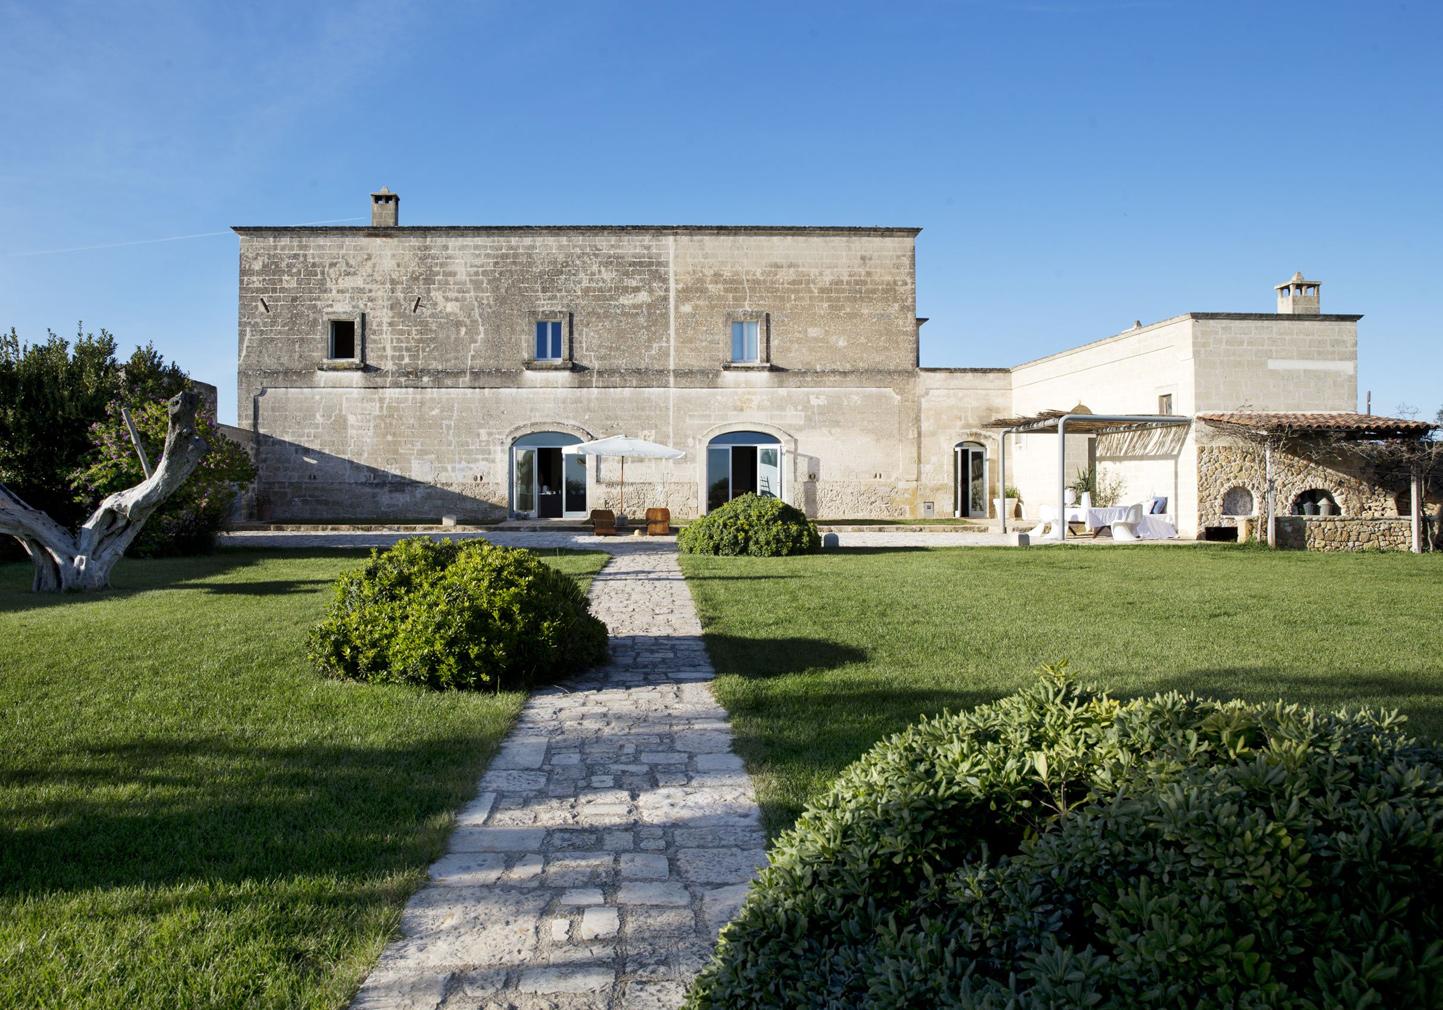 Exterior of Masseria Angiulli Piccolo